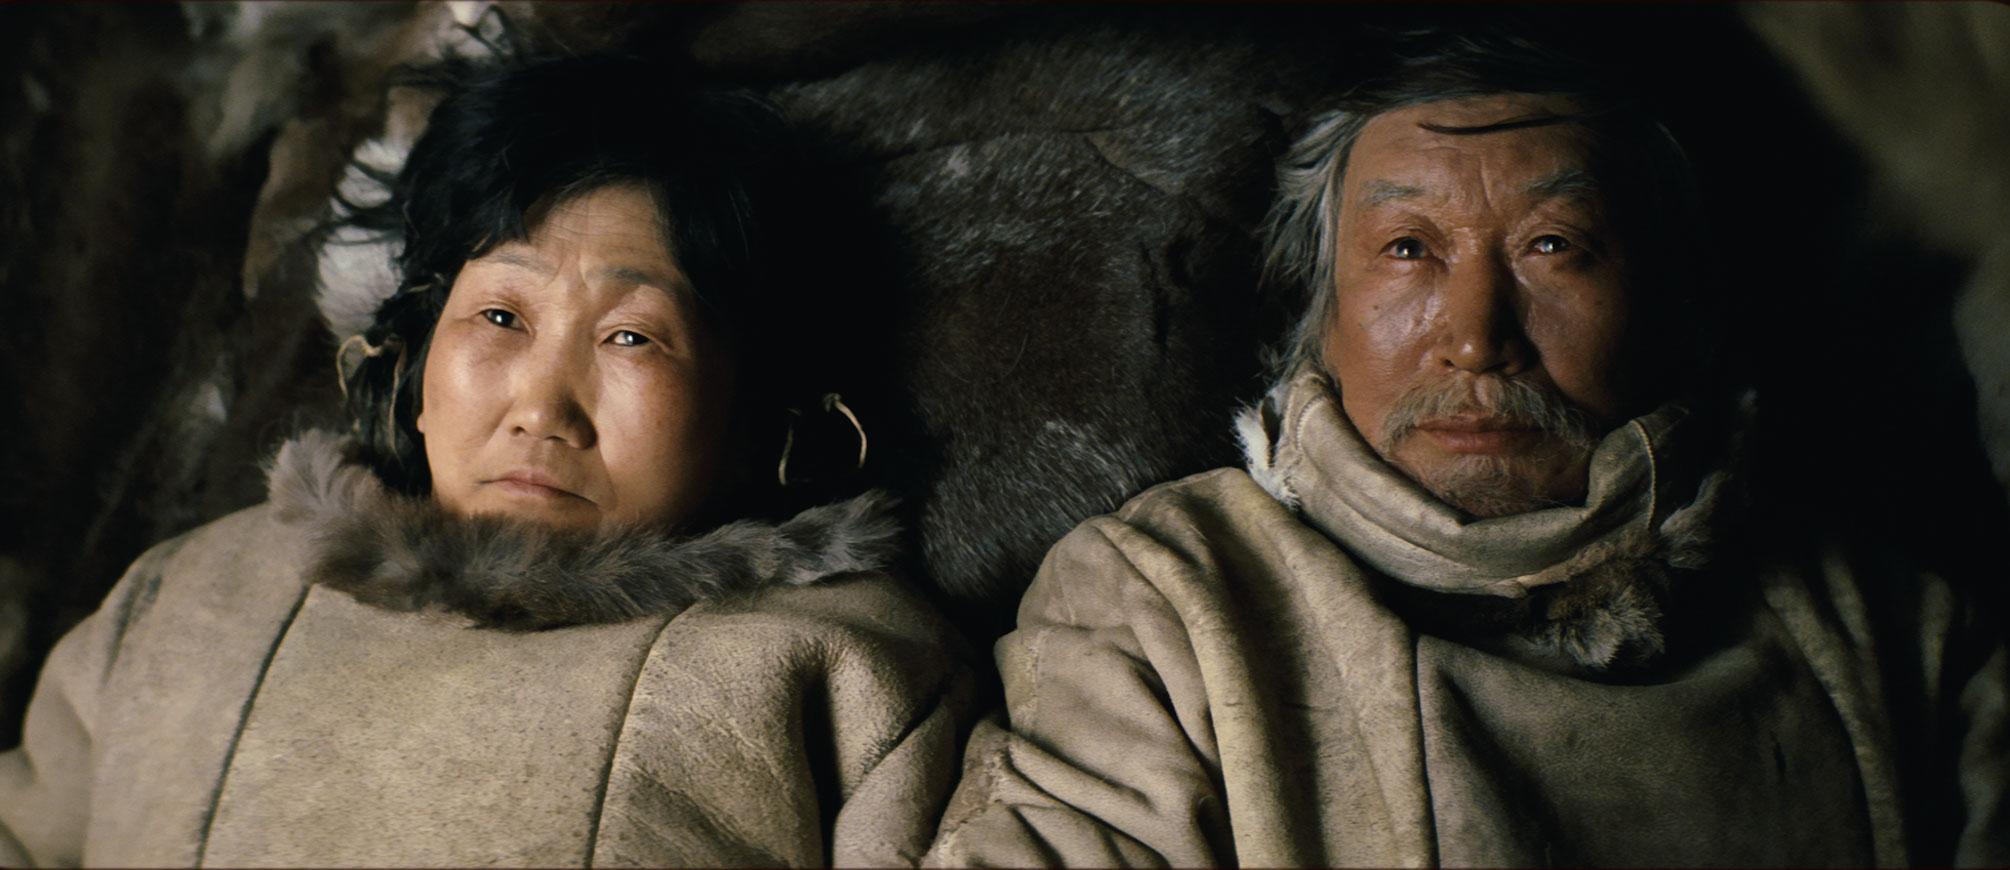 AGA - Director: Milko LazarovCountry: BulgariaRun time: 1 Hour 36 MinutesLanguage: Yakut with English subtitles